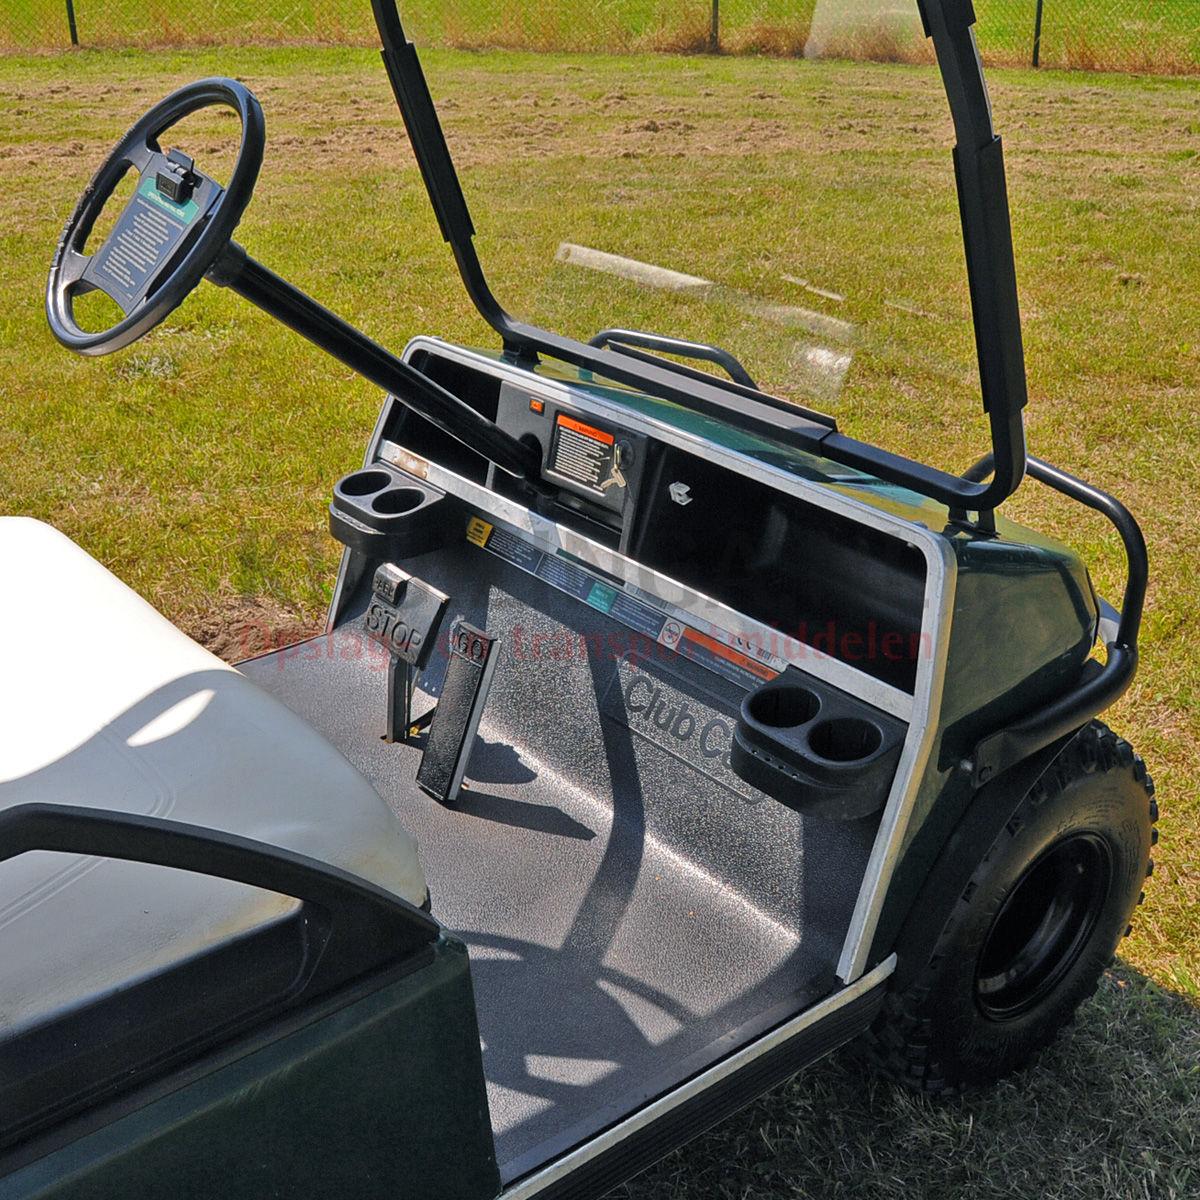 golfwagen club car lynx f r 2 personen elektrisch. Black Bedroom Furniture Sets. Home Design Ideas